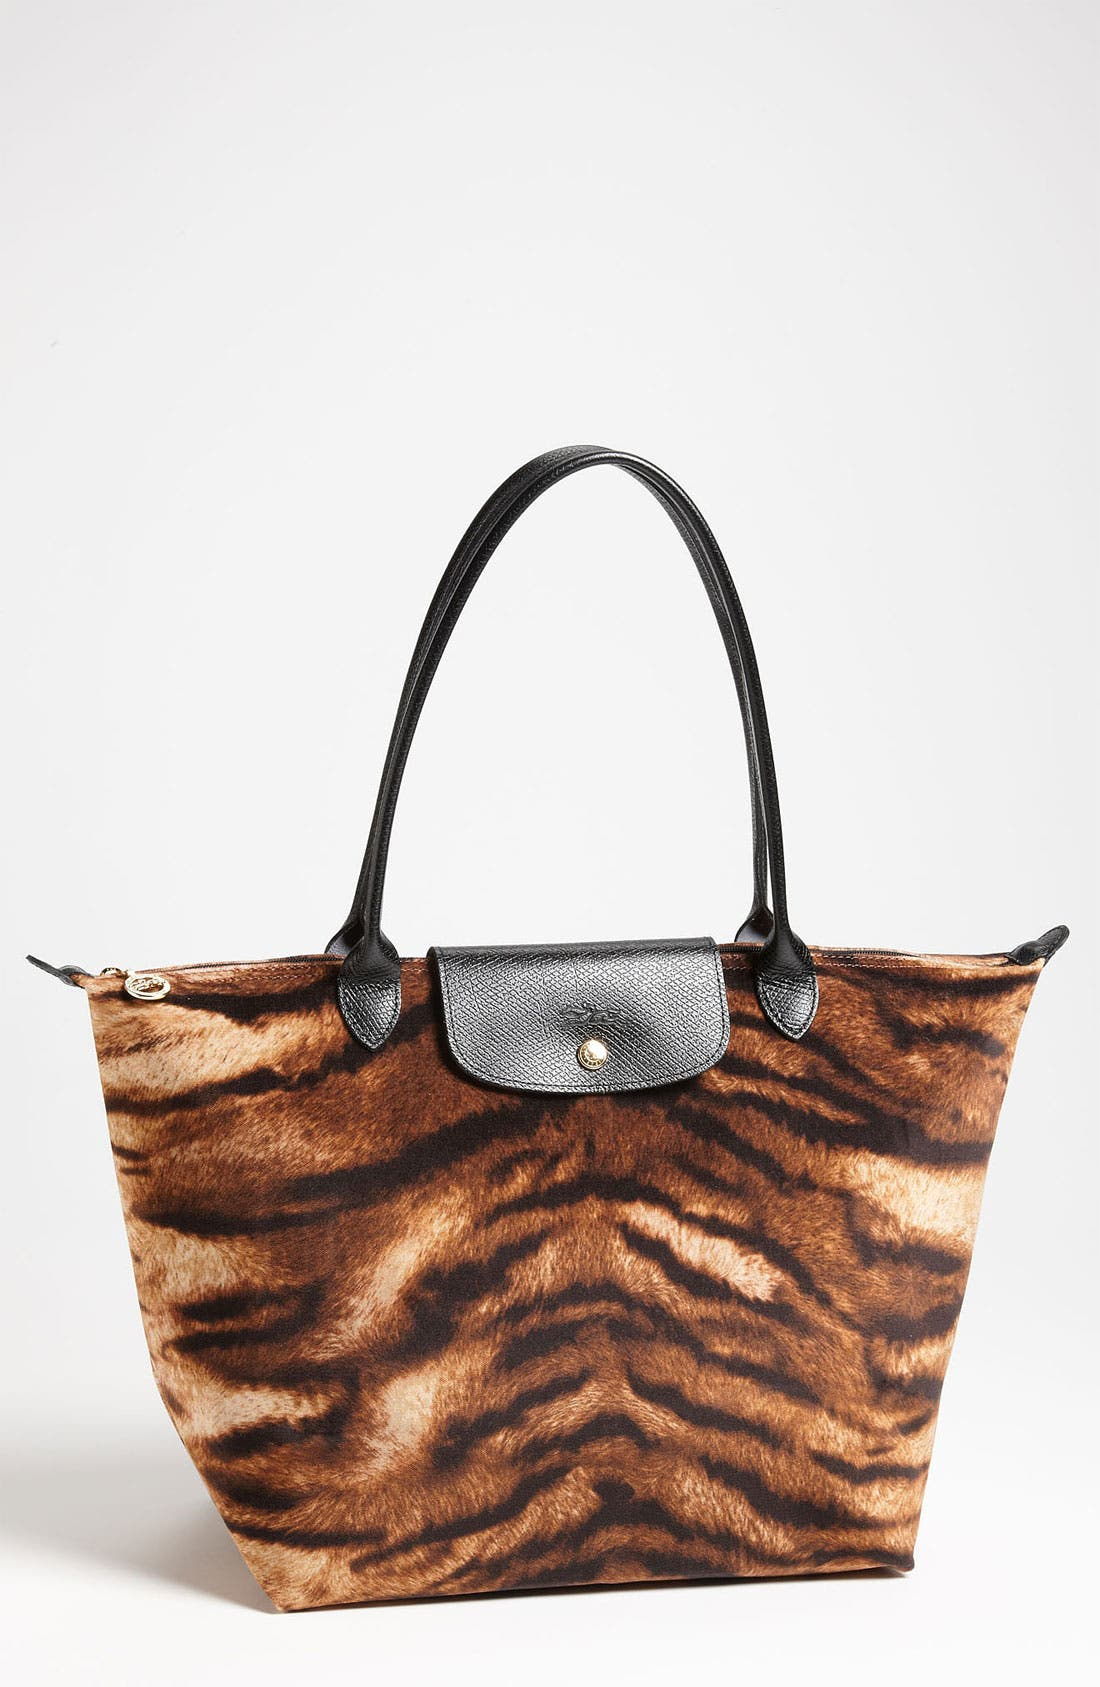 Alternate Image 1 Selected - Longchamp 'Le Pliage Tigre' Large Shoulder Tote